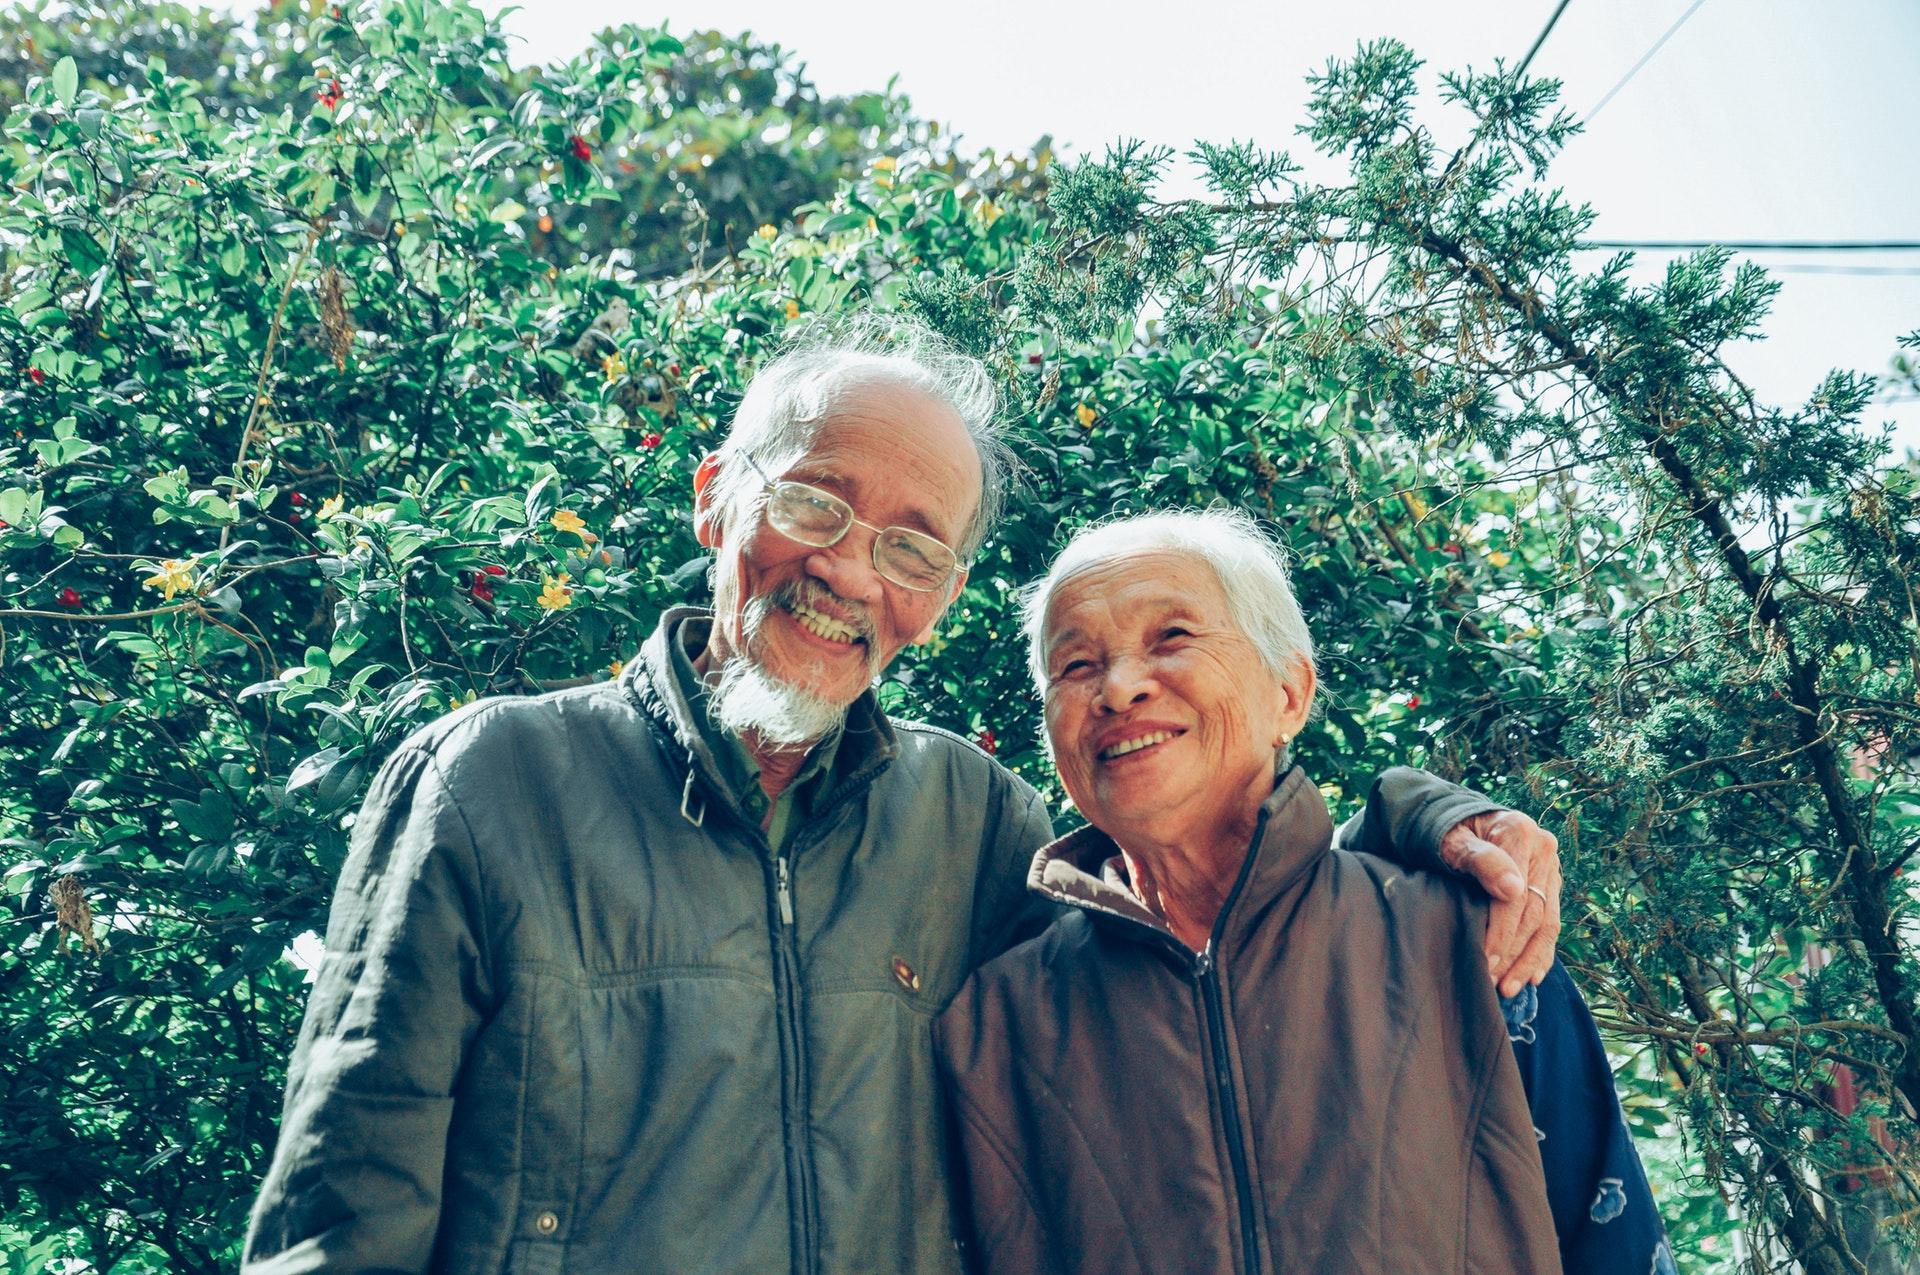 vitamin d might help prevent dementia